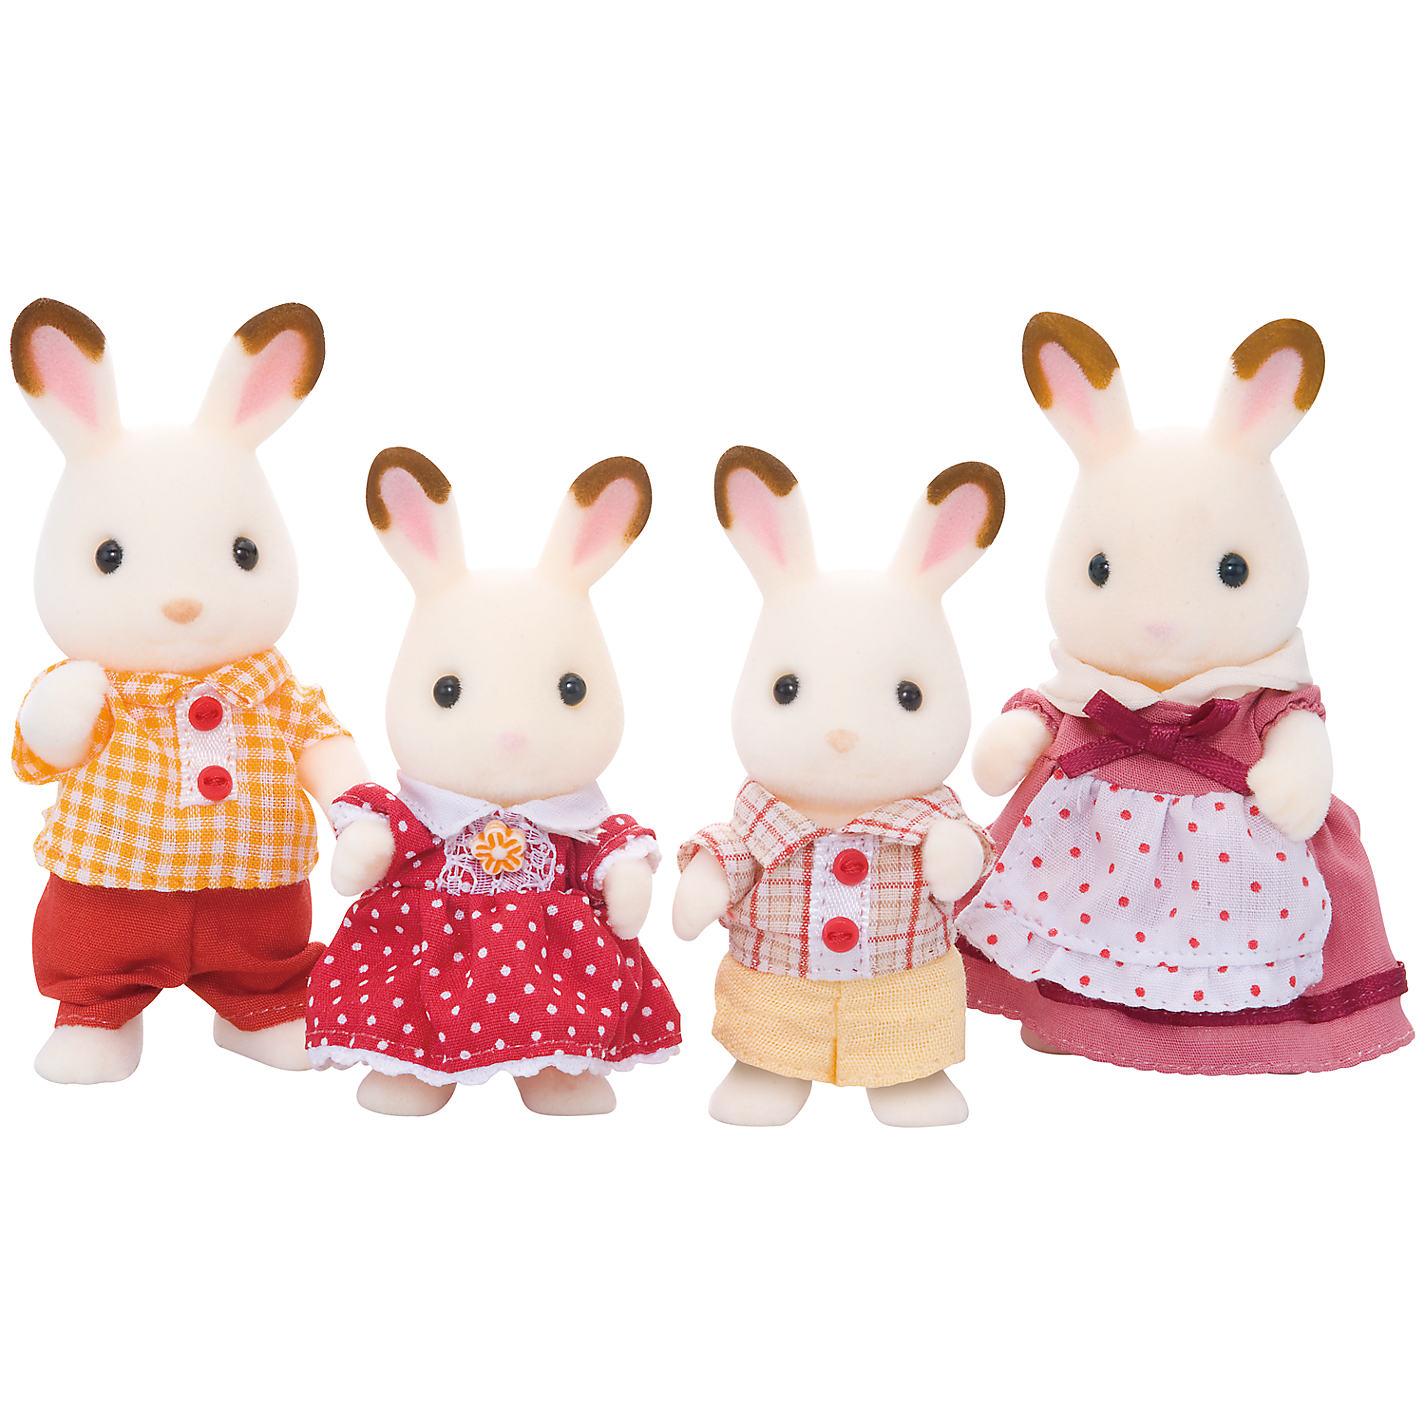 Sylvanian families easter toys gifts john lewis buy sylvanian families chocolate rabbit family online at johnlewis negle Choice Image